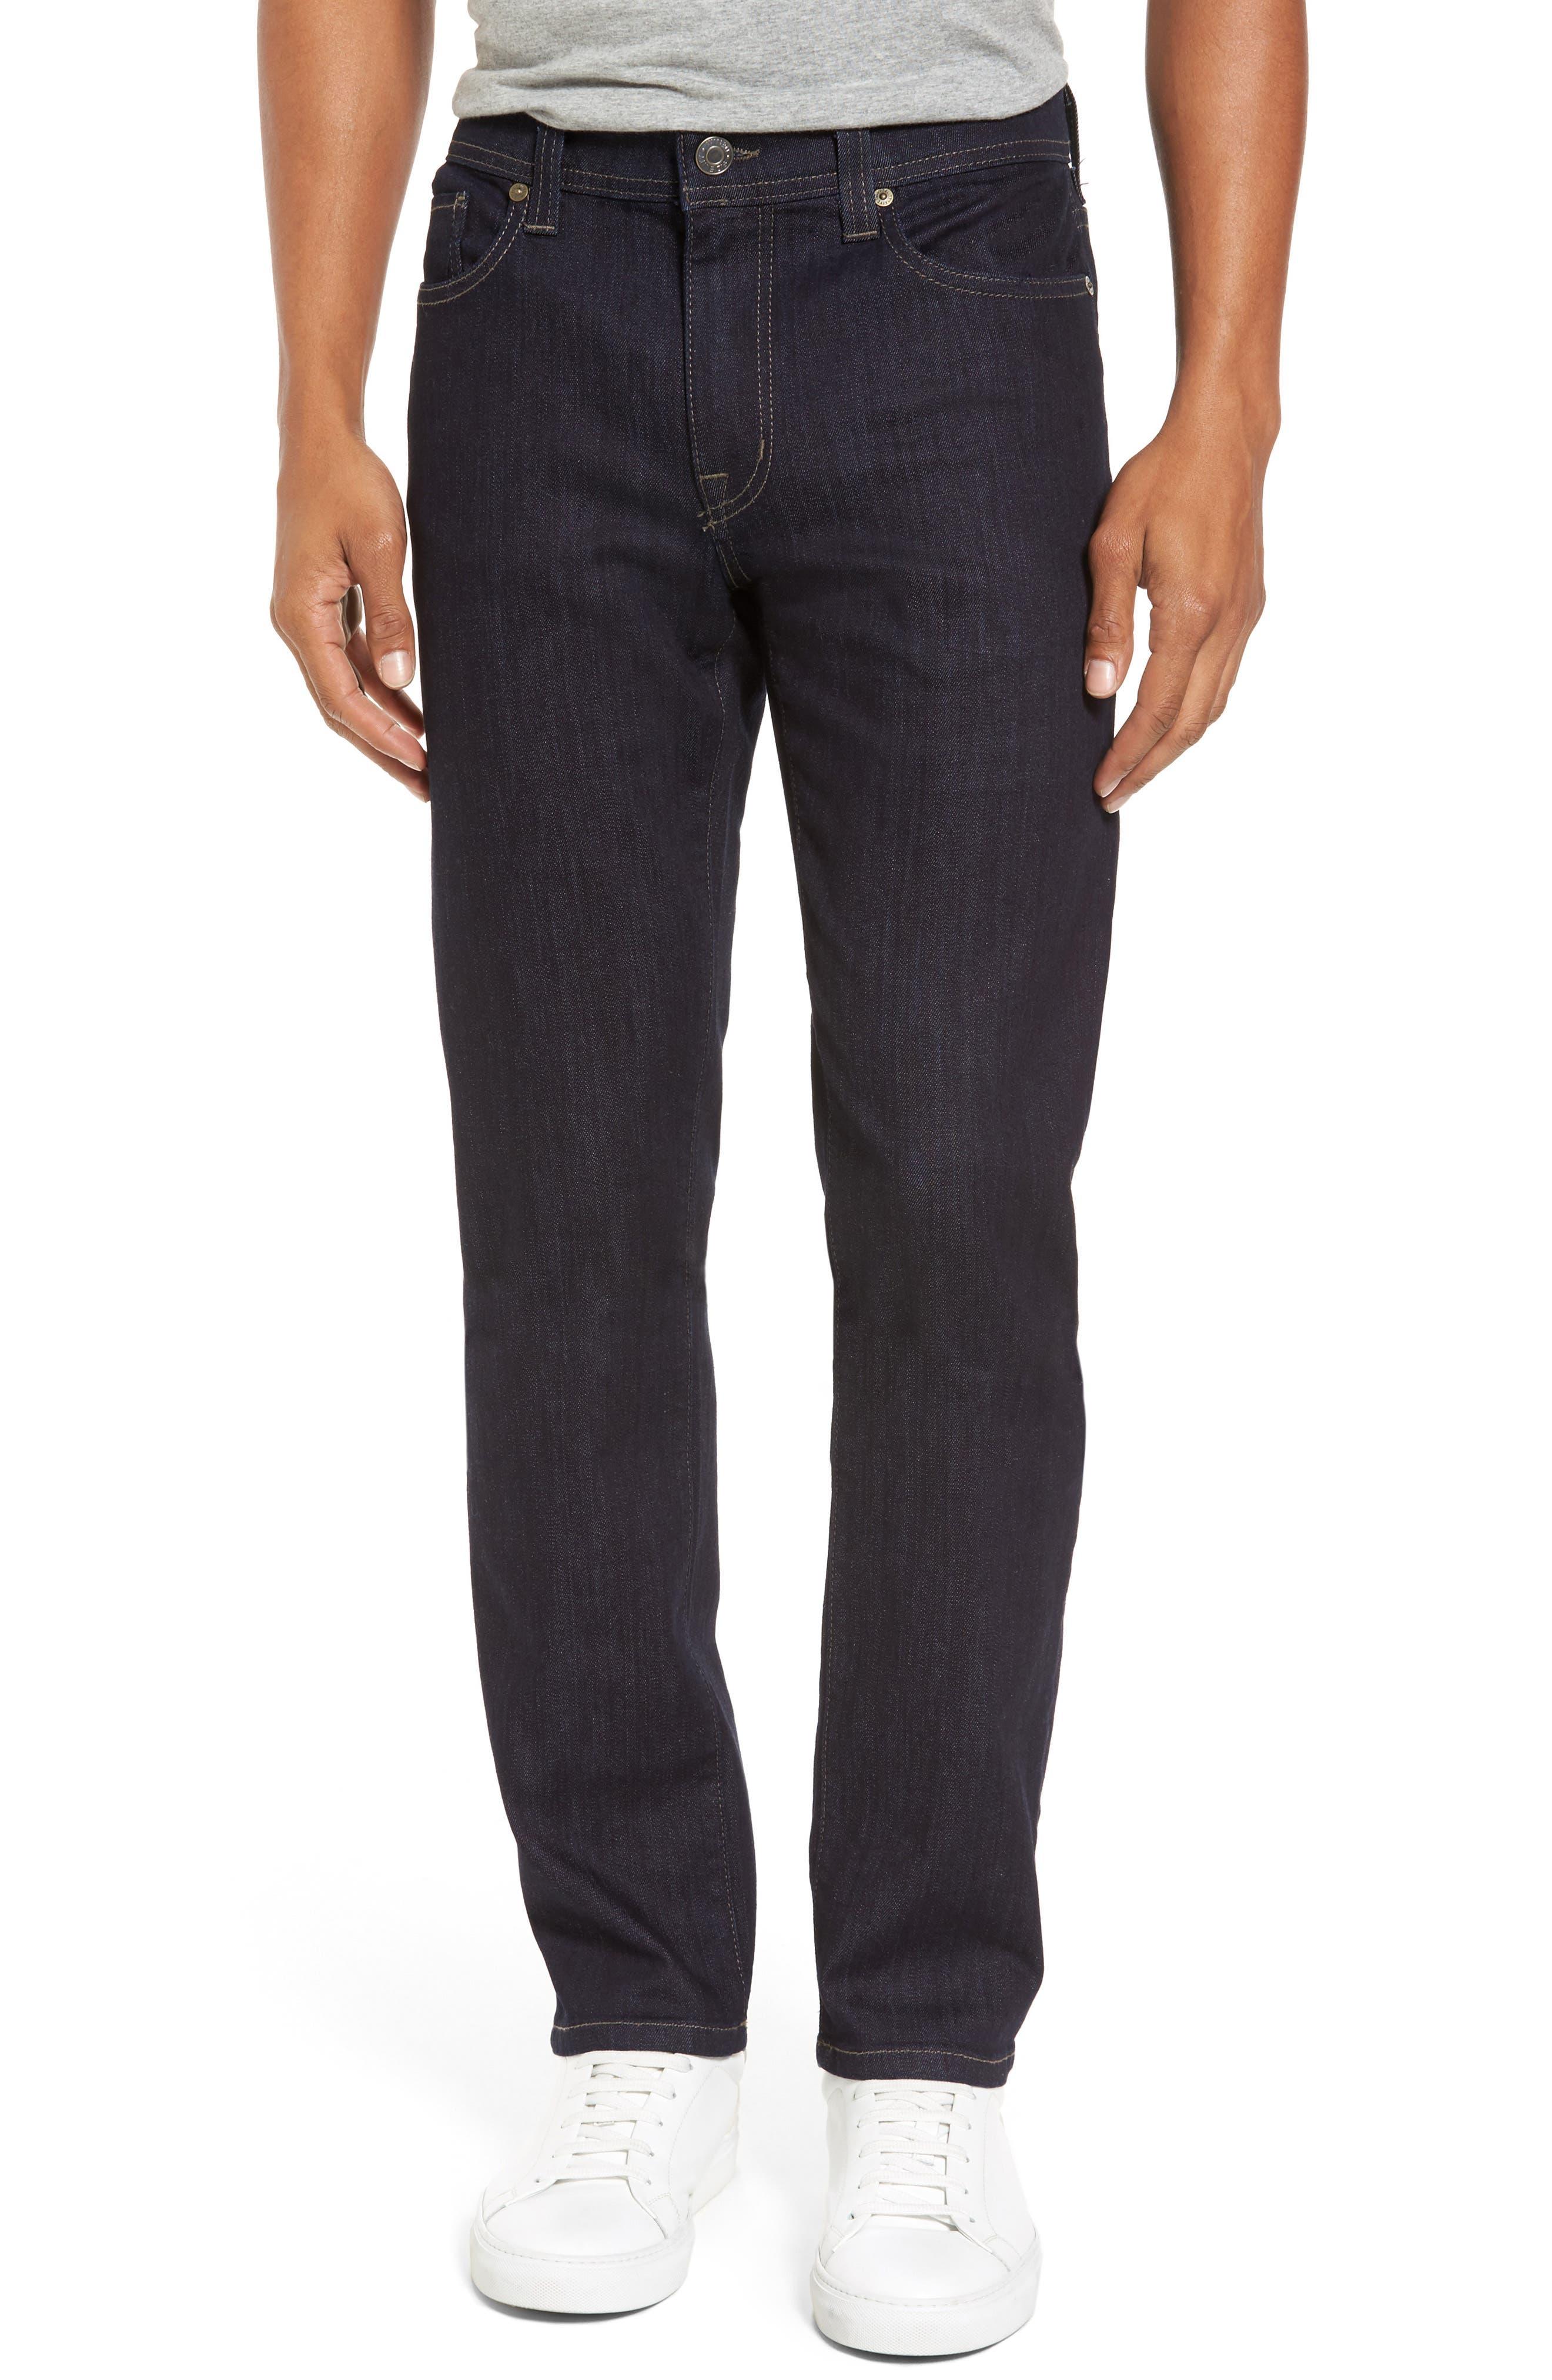 Main Image - Fidelity Denim Jimmy Slim Straight Leg Jeans (Galaxy Rinse)